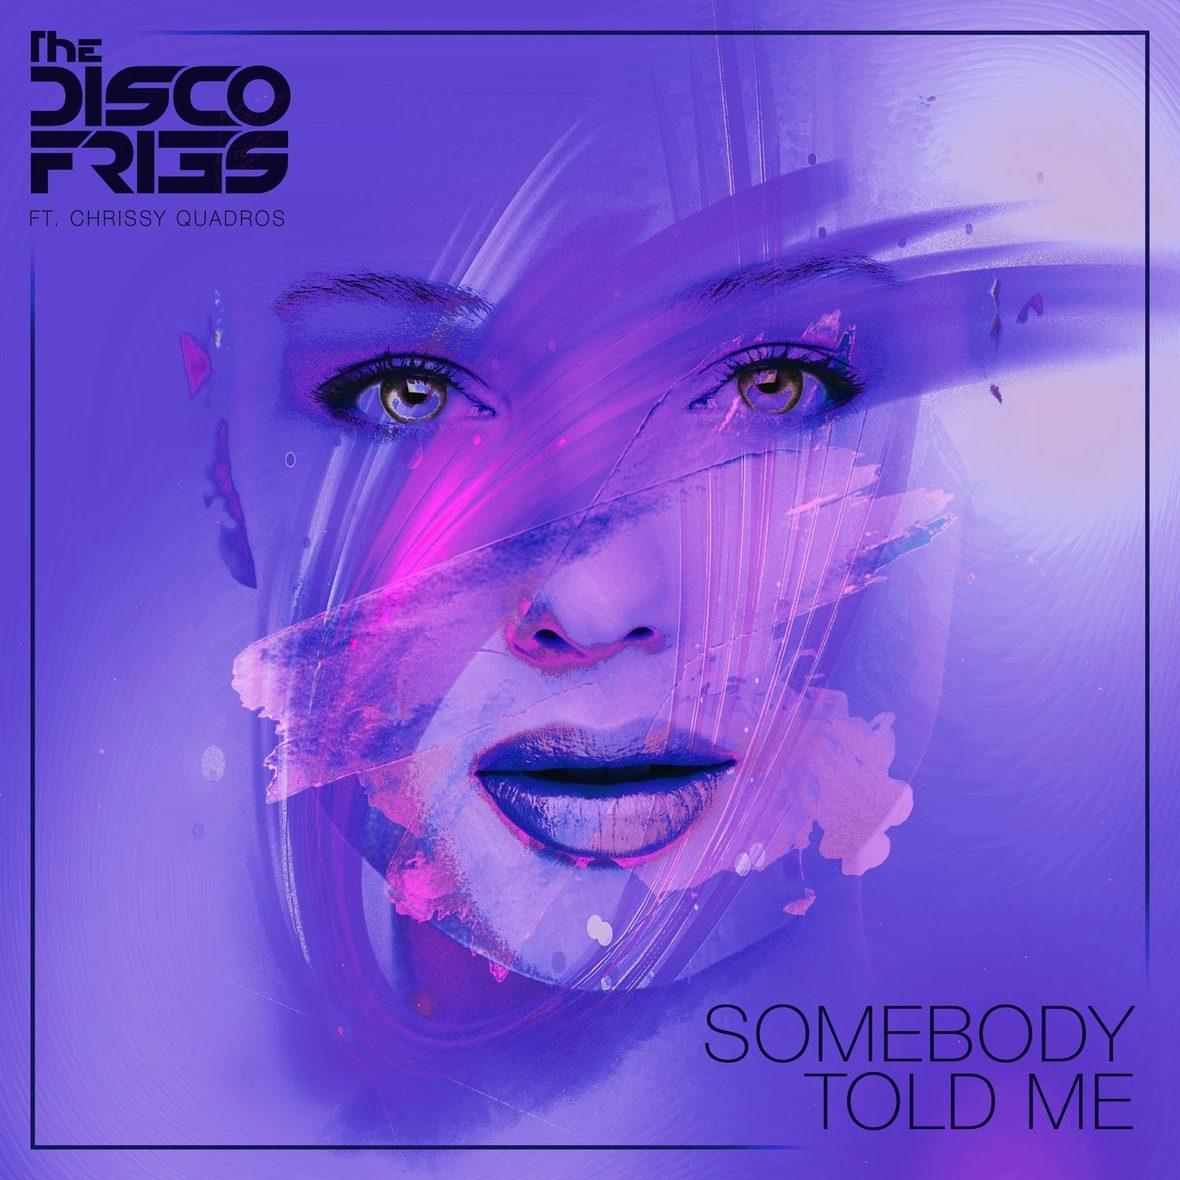 Disco Fries - Sombody Told Me ft. Chrissy Quadros  Cover Art